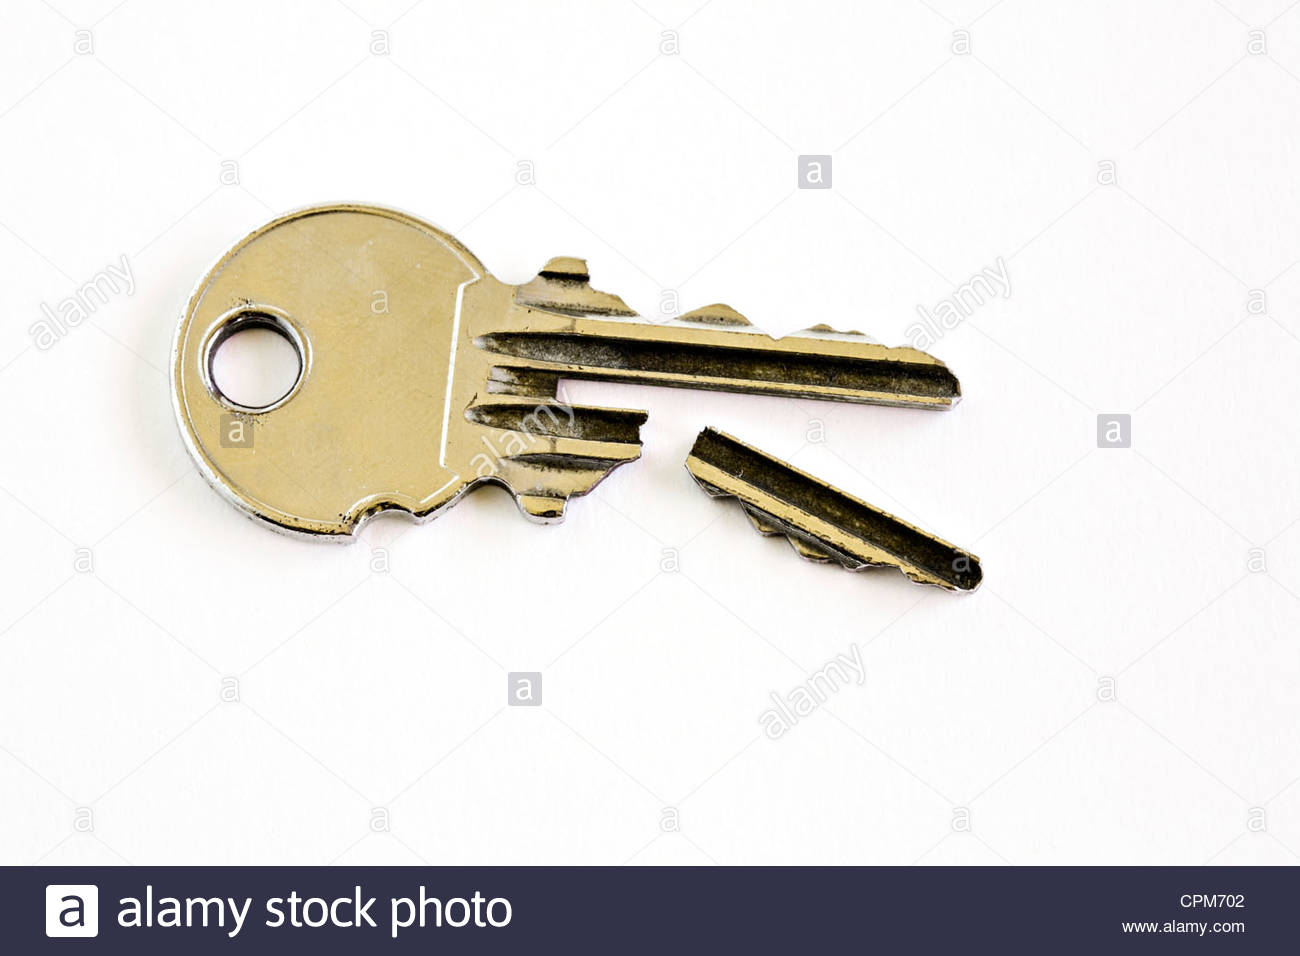 Close-up of broken key on white background - Stock Image